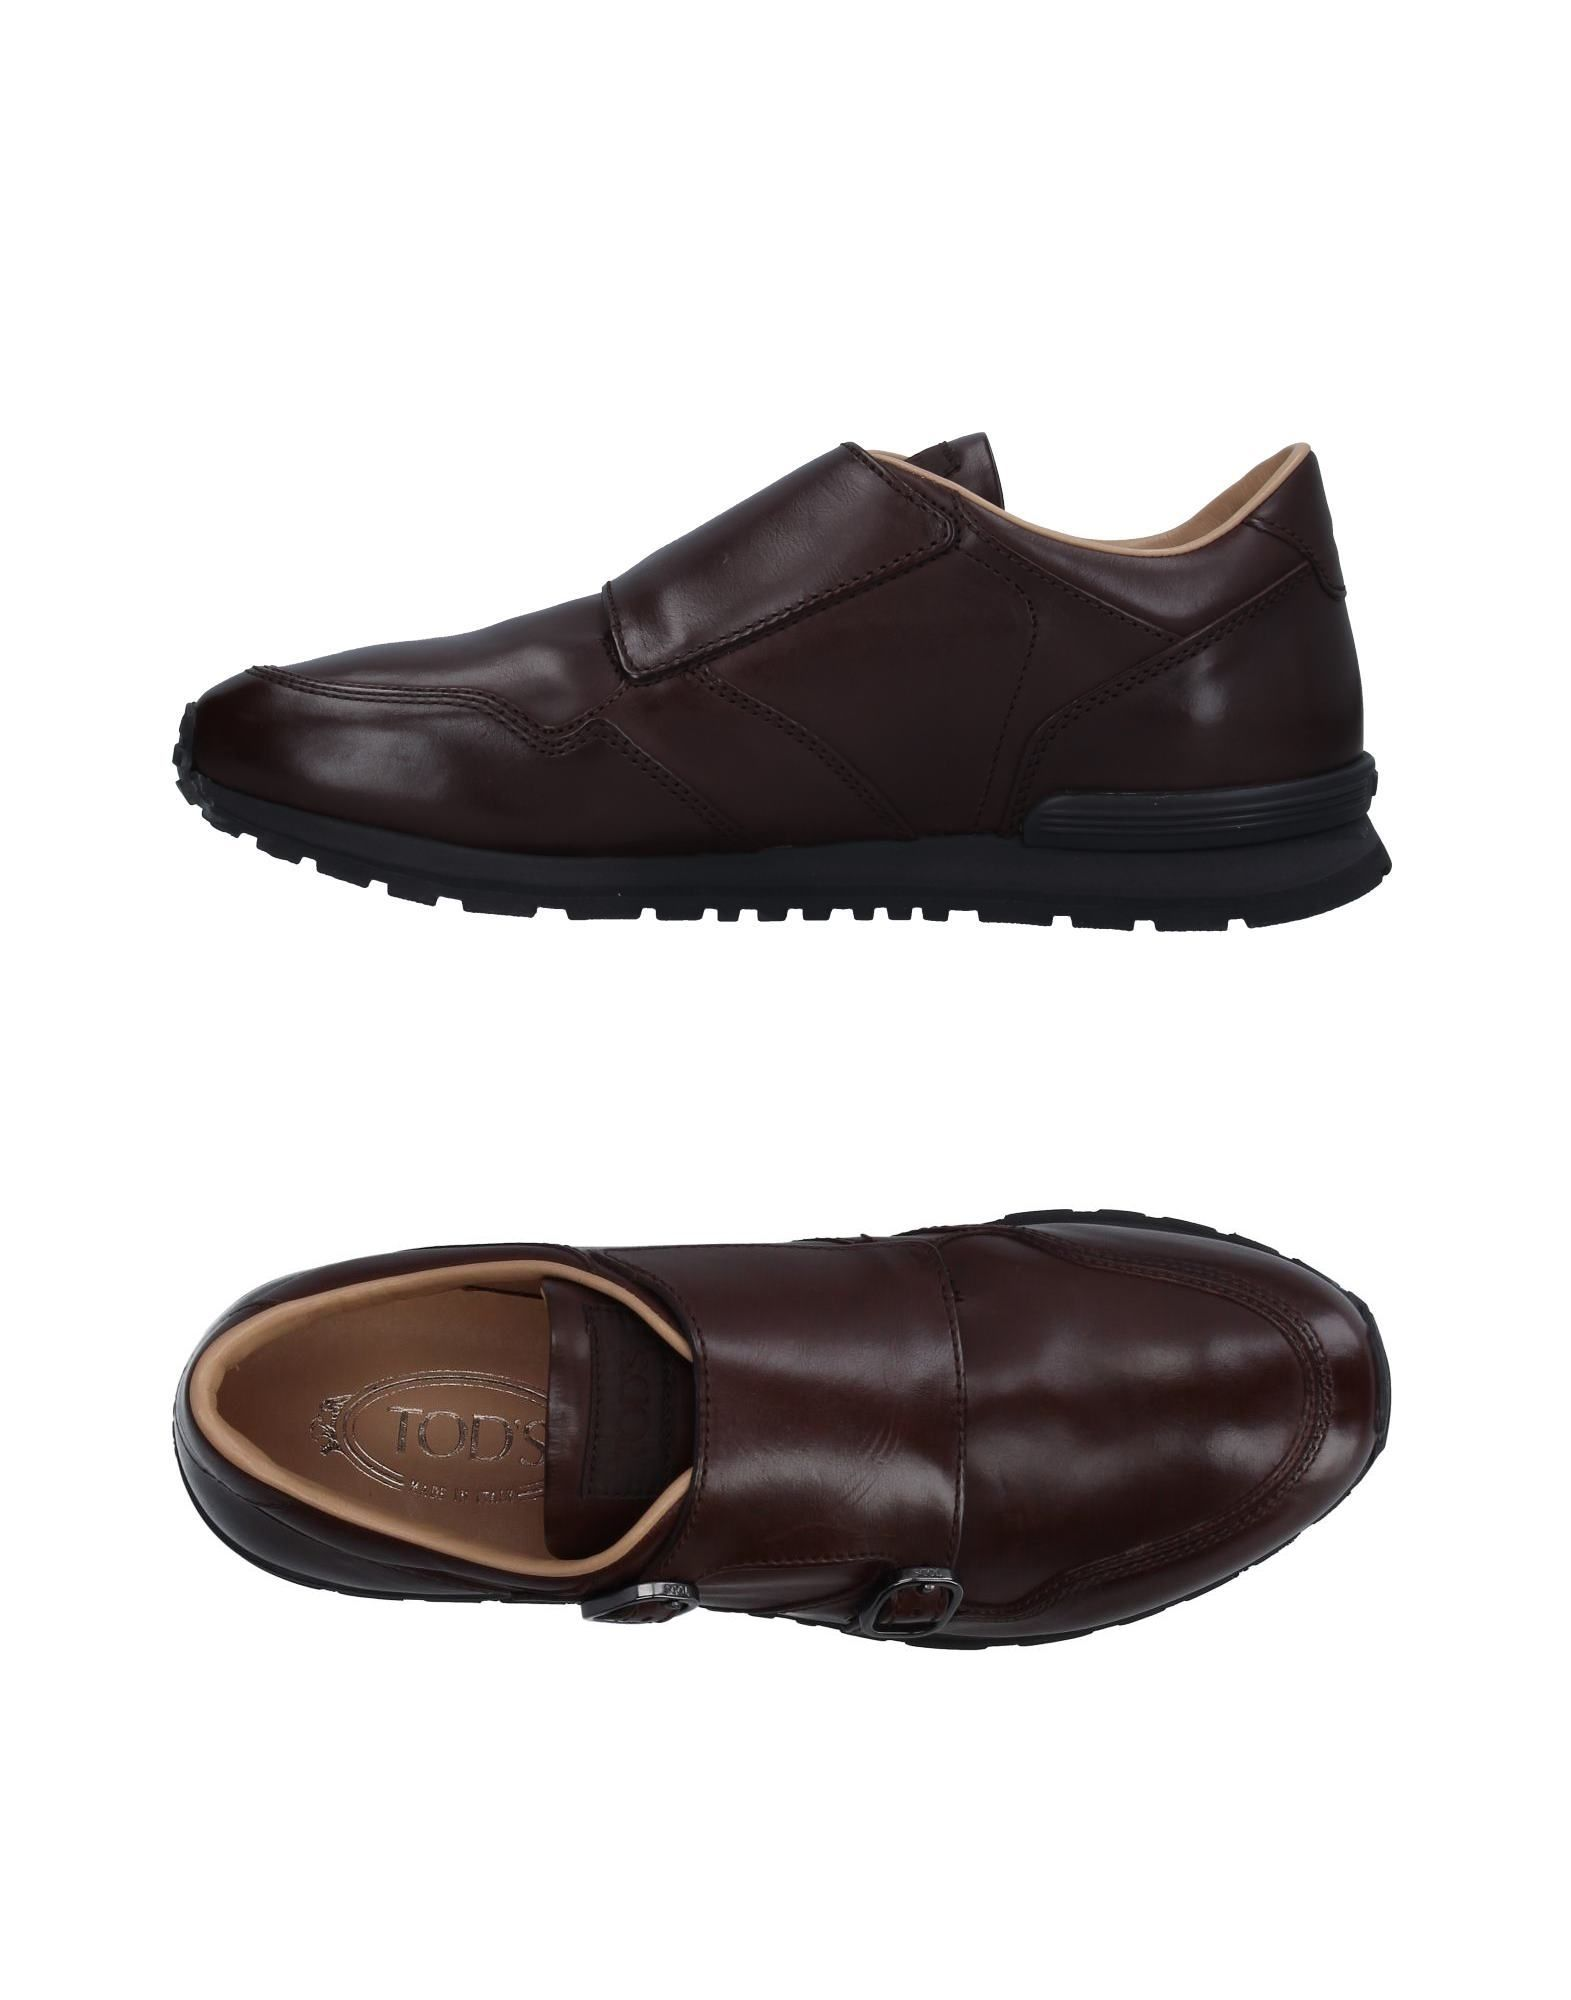 Tod's Sneakers Herren  11298848CB Gute Qualität beliebte Schuhe